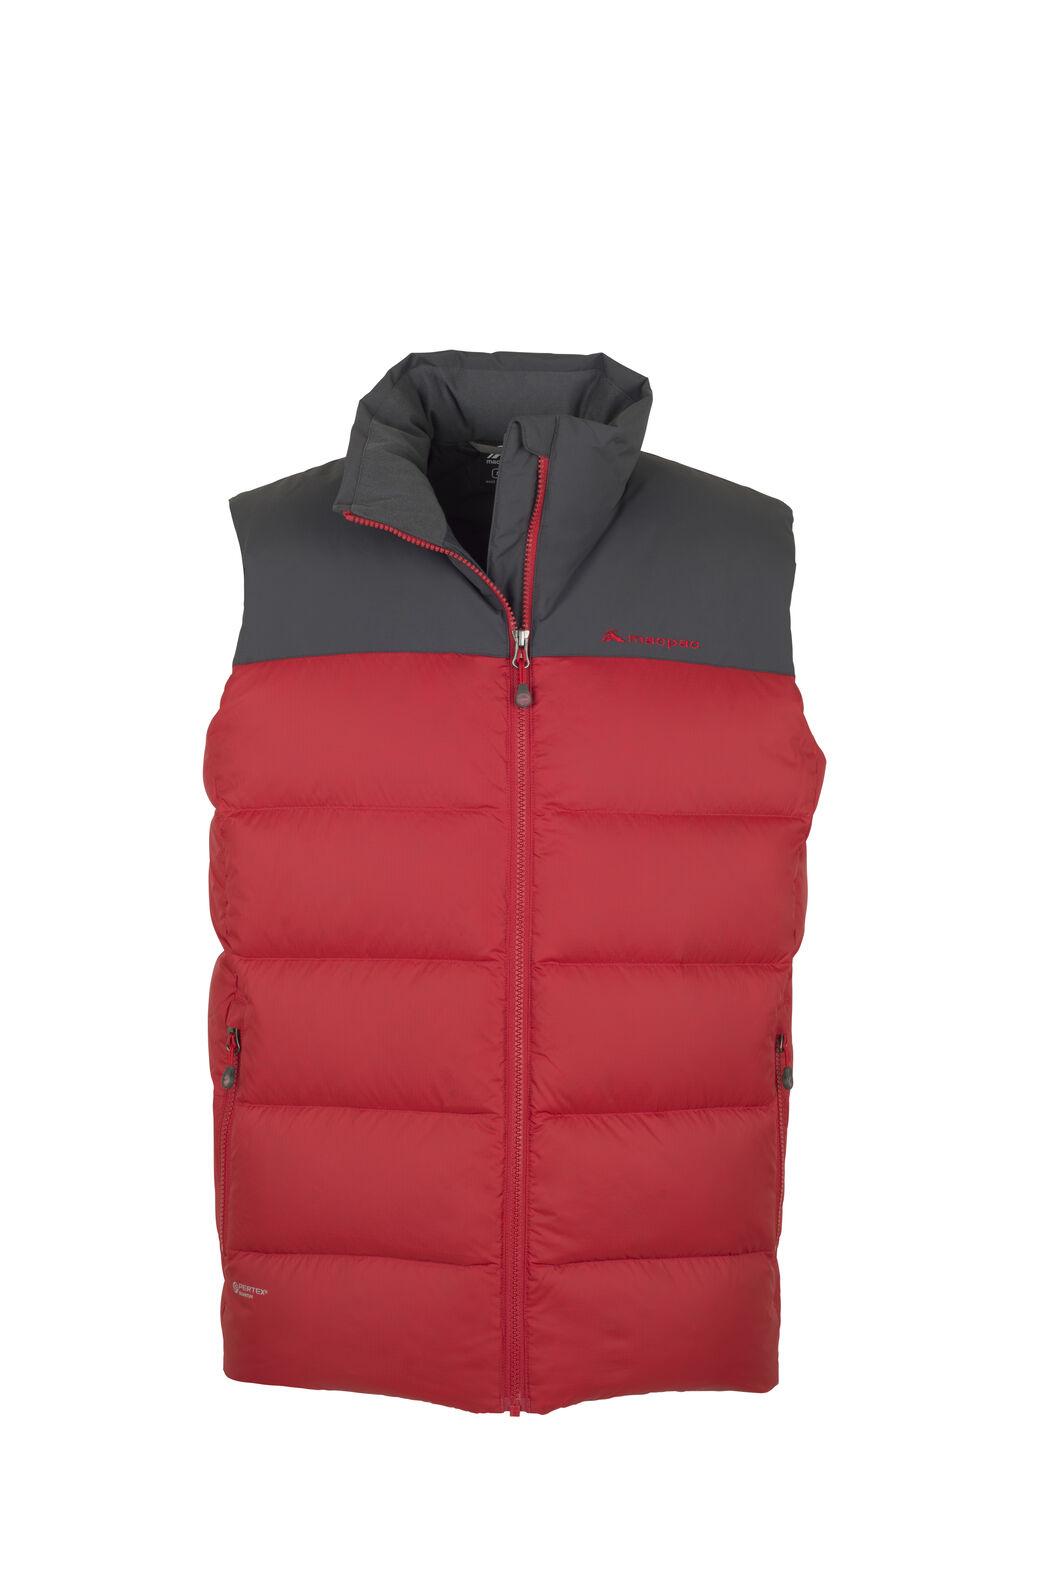 Macpac Ember Vest - Men's, Haute Red/Asphalt, hi-res